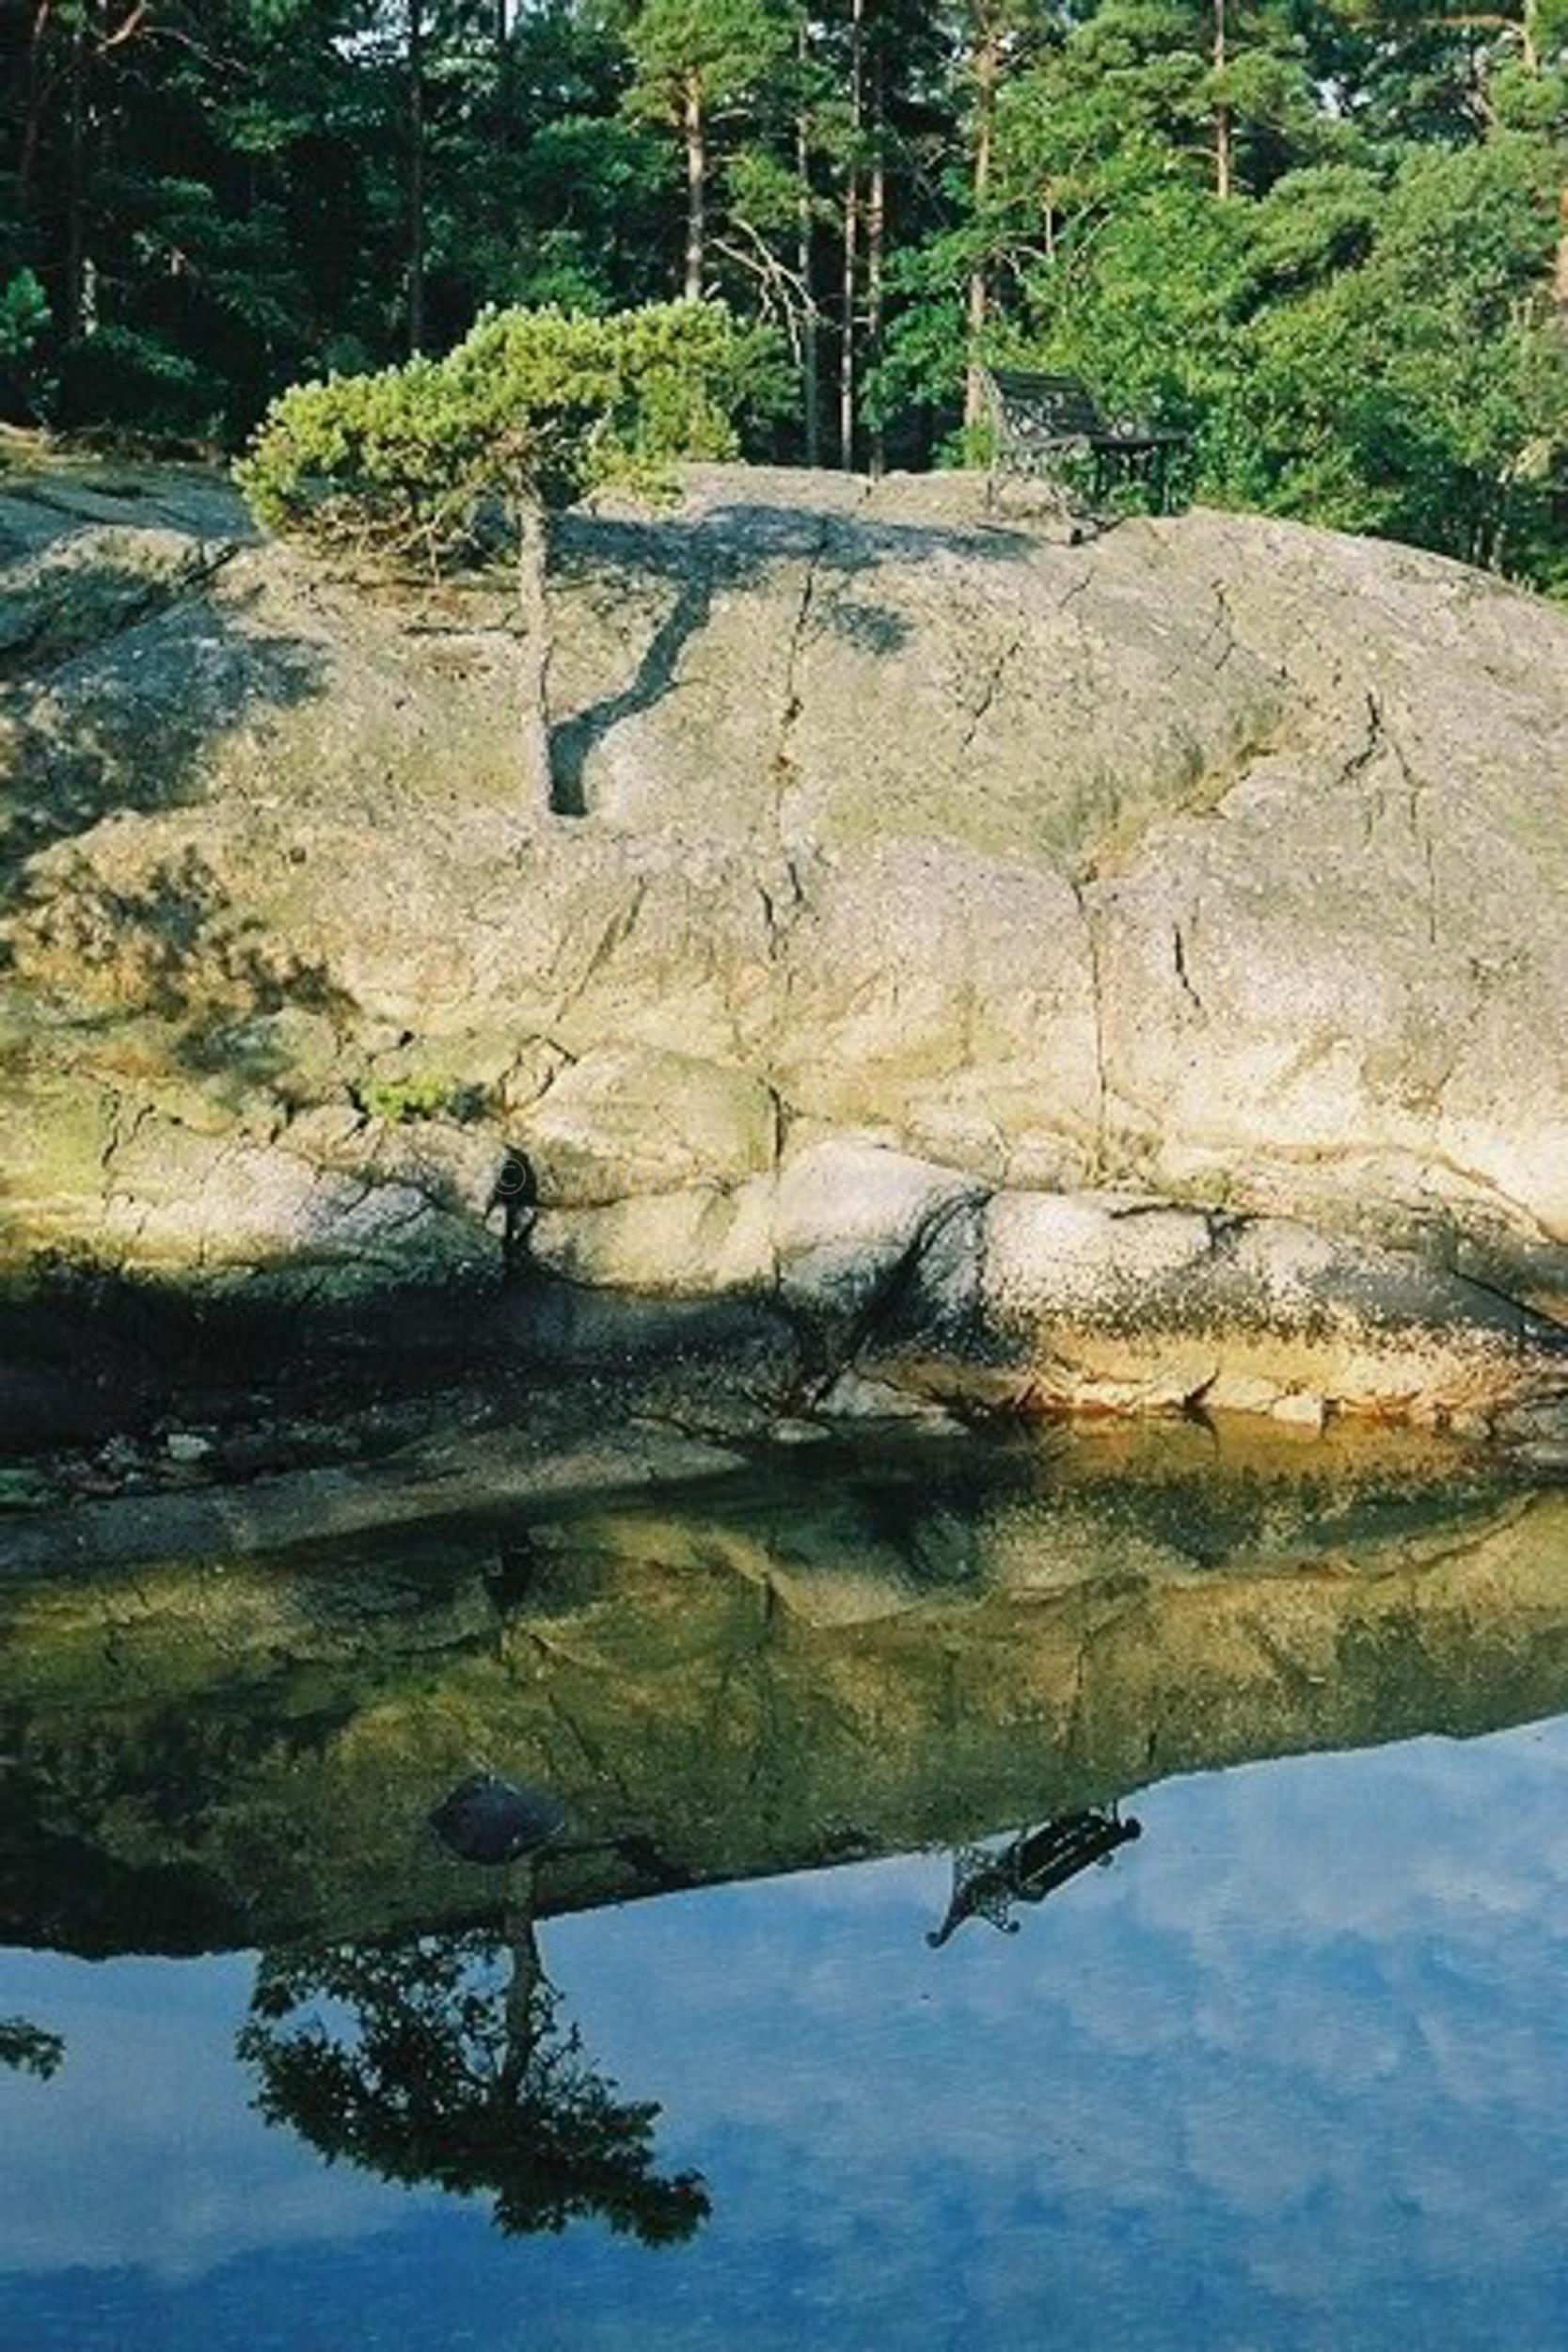 JE0207_09, Stockholms skärgård sommaren 2002, Jonas Engström